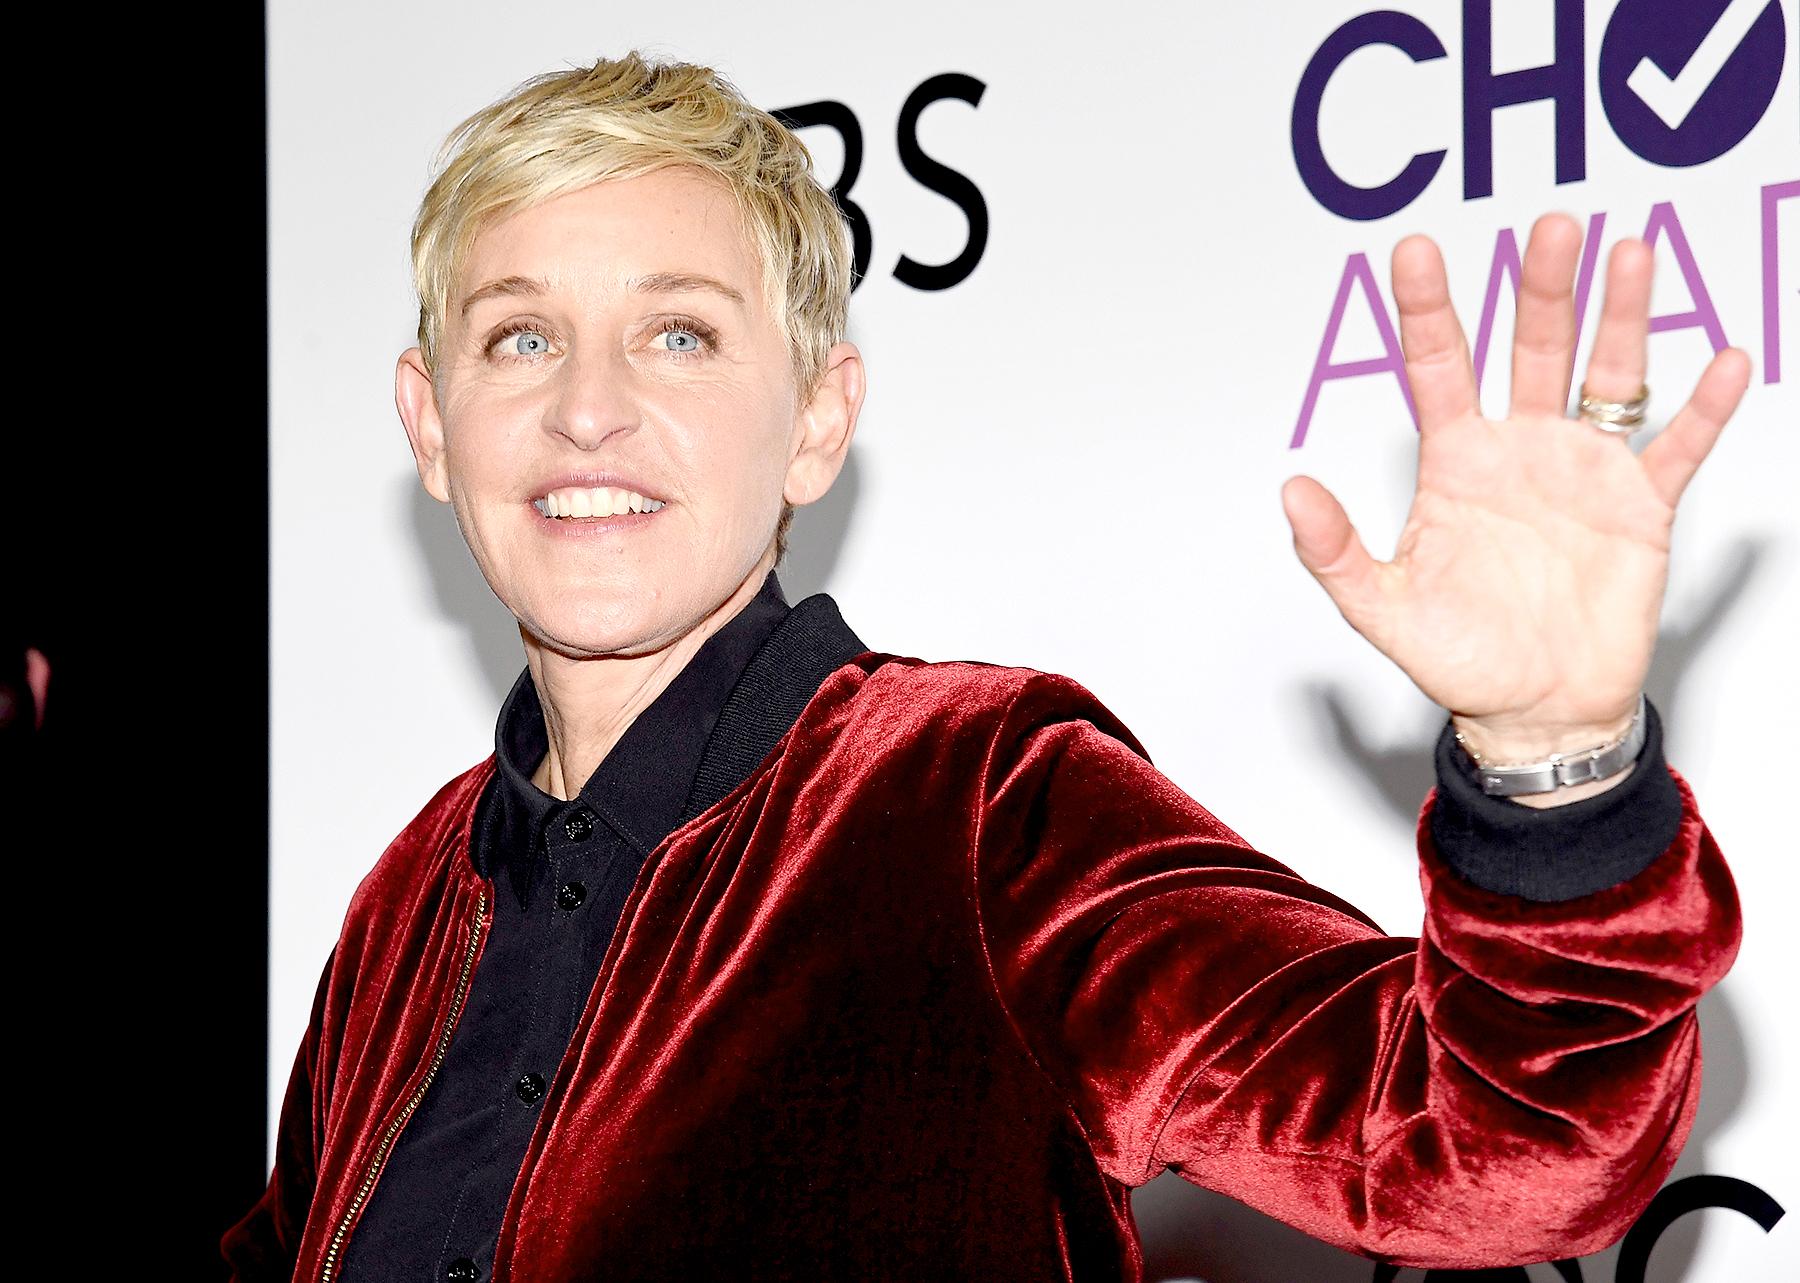 Ellen Degeneres social media